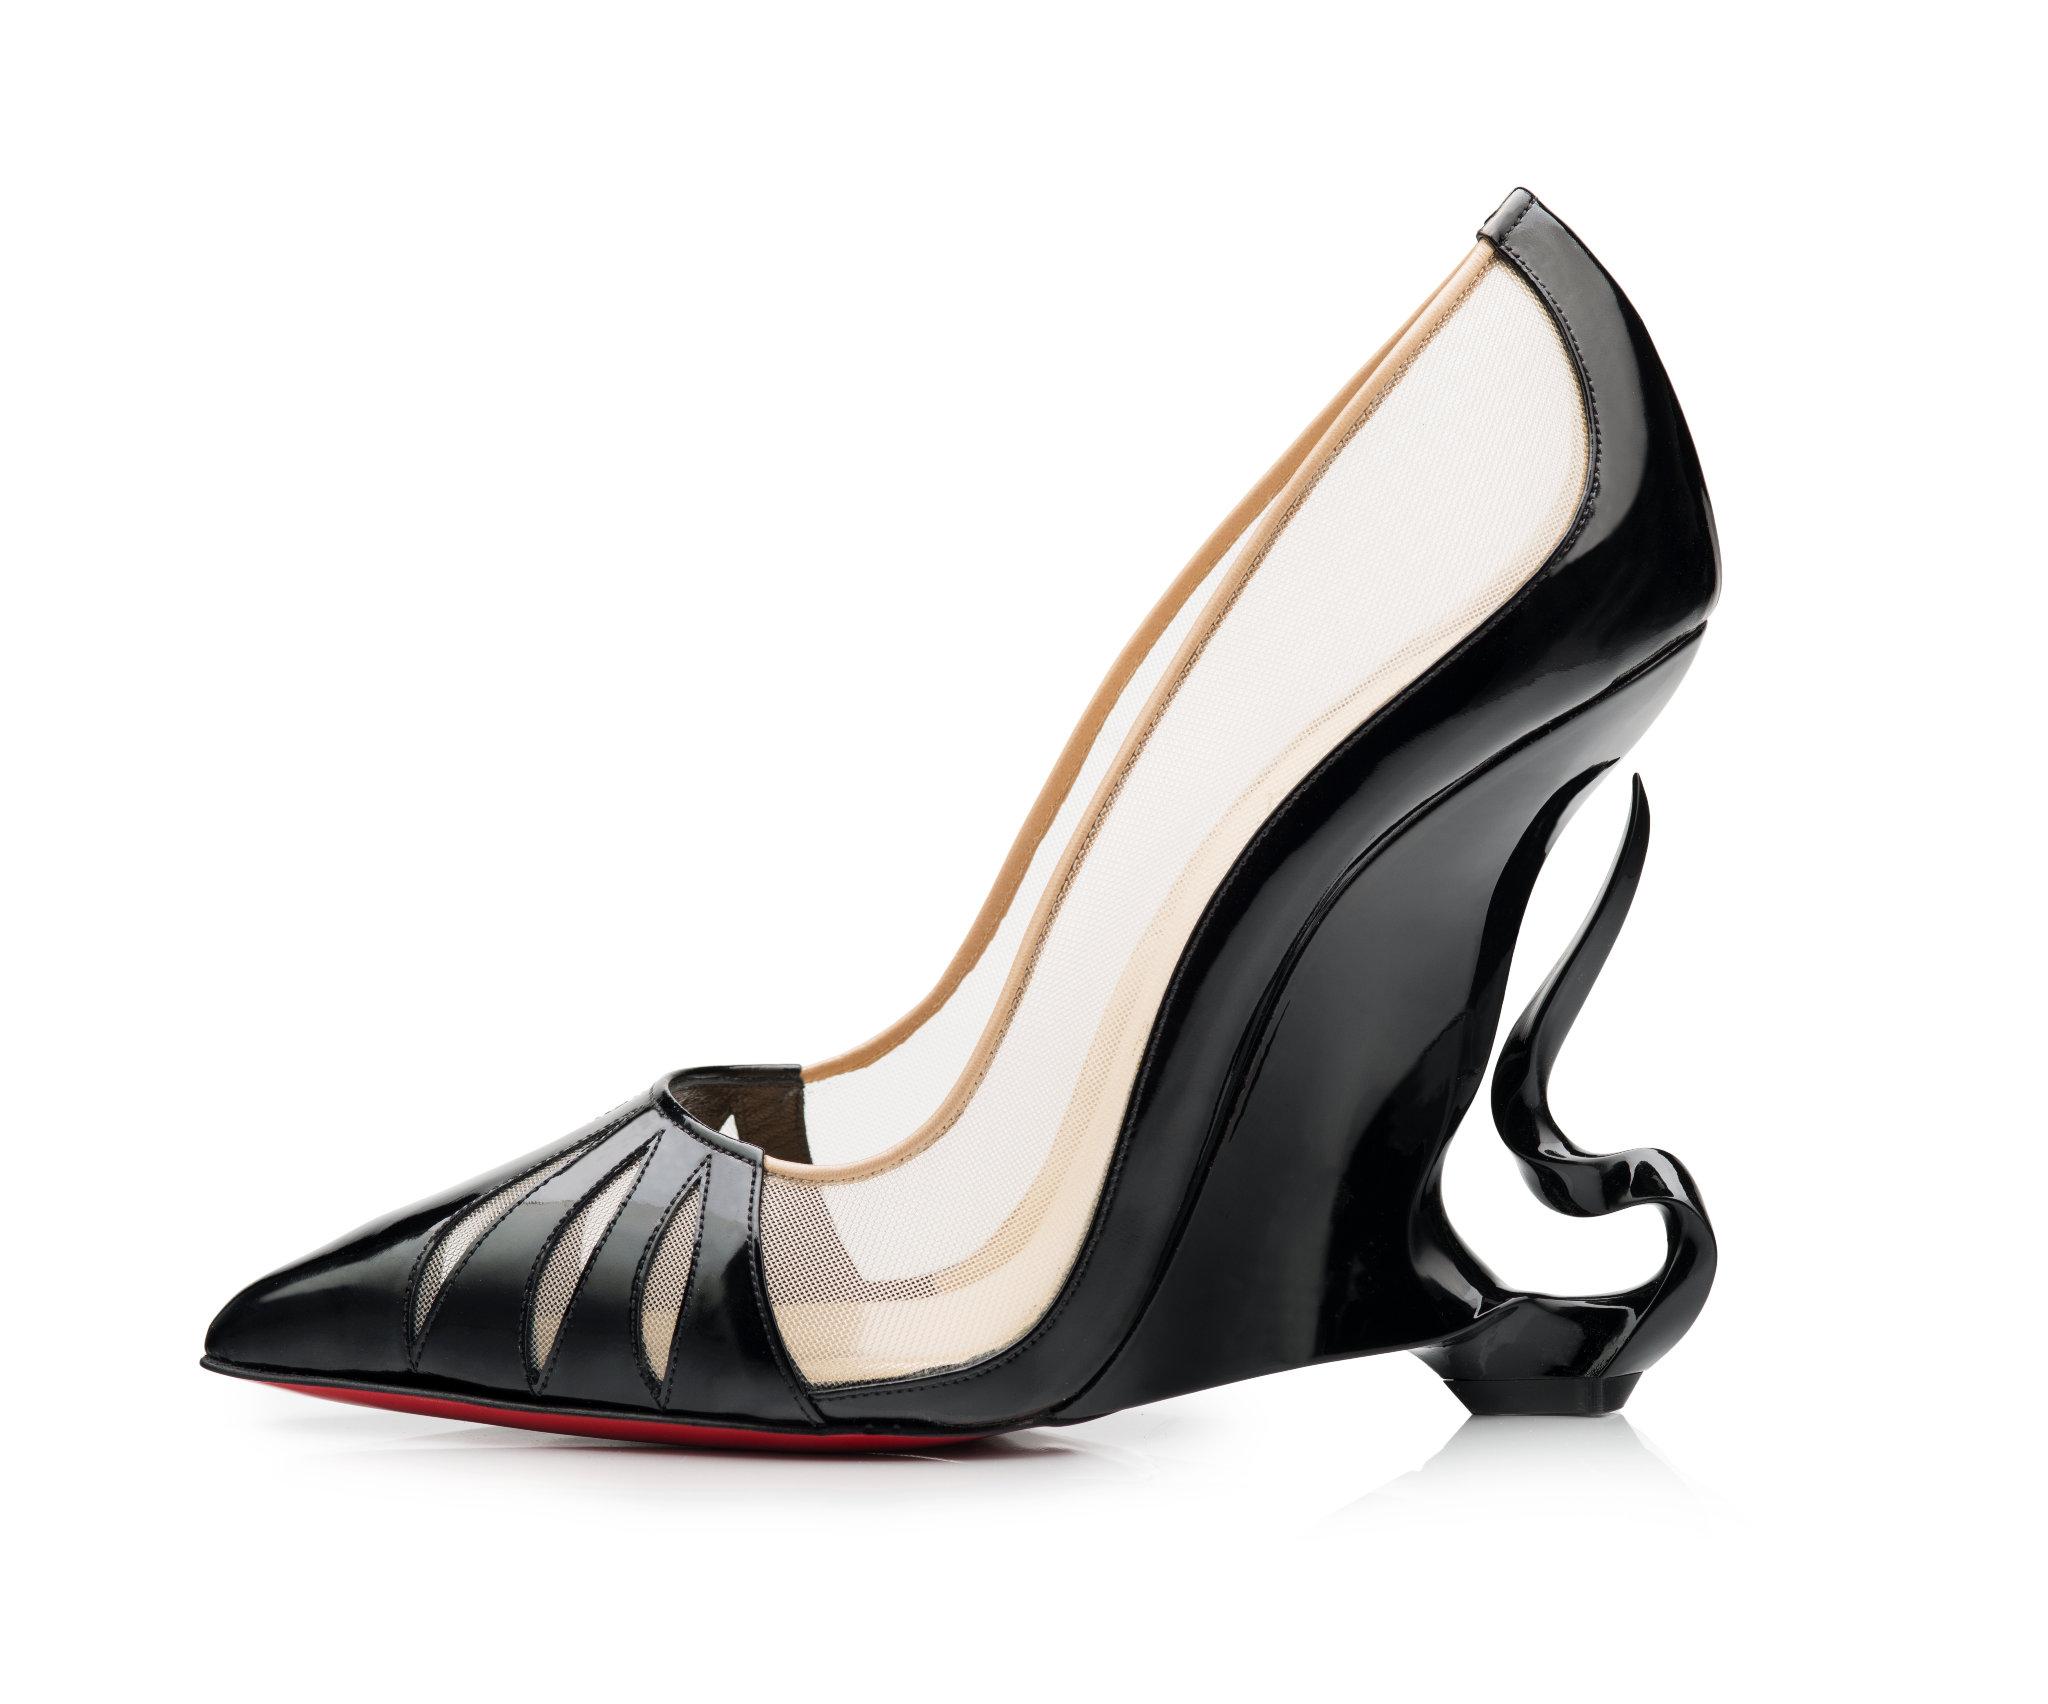 a5e0b6c19c84 Malangeli  Christian Louboutin s Maleficent heels